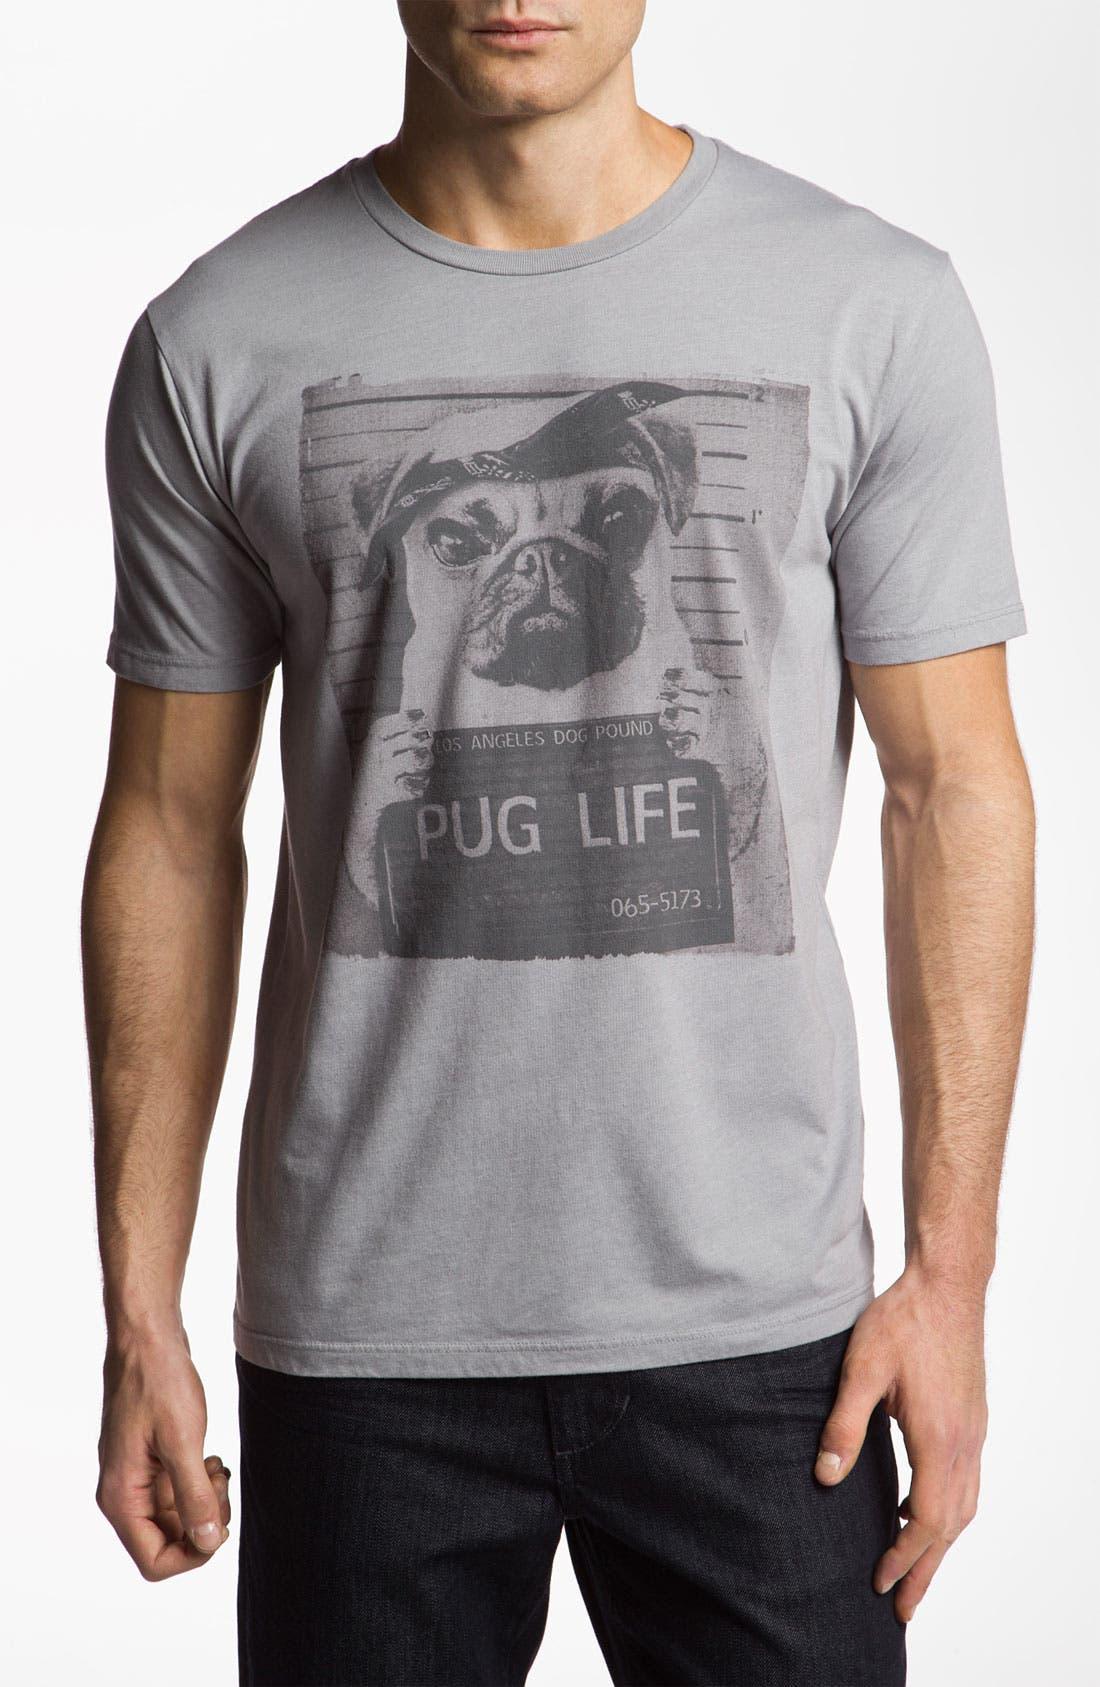 Alternate Image 1 Selected - Junk Food 'Pug Life' T-Shirt